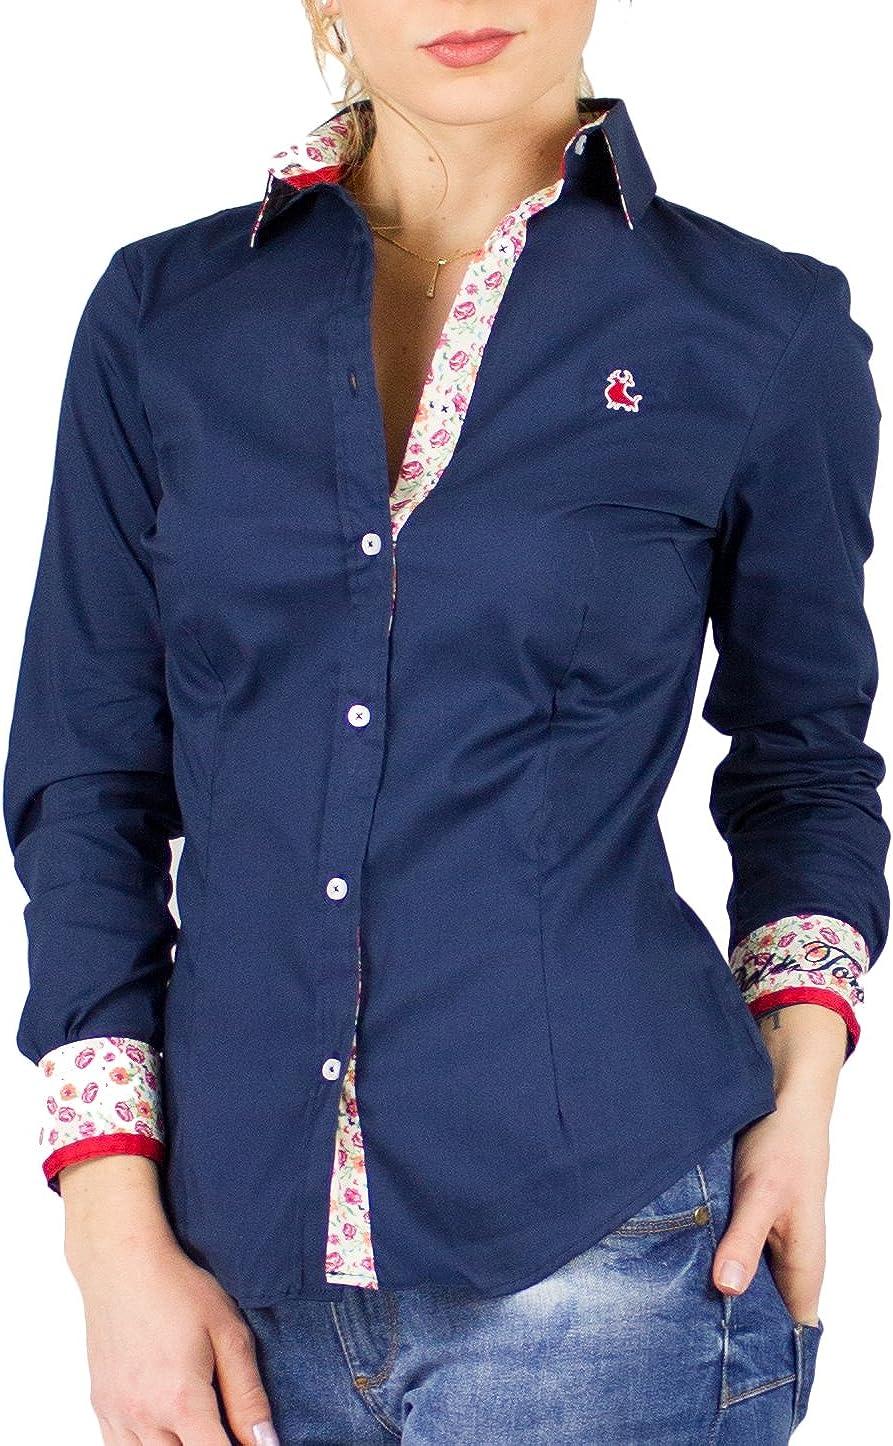 Piel de Toro 42140542 Camisa, Azul (Azul Marino 01), Medium ...